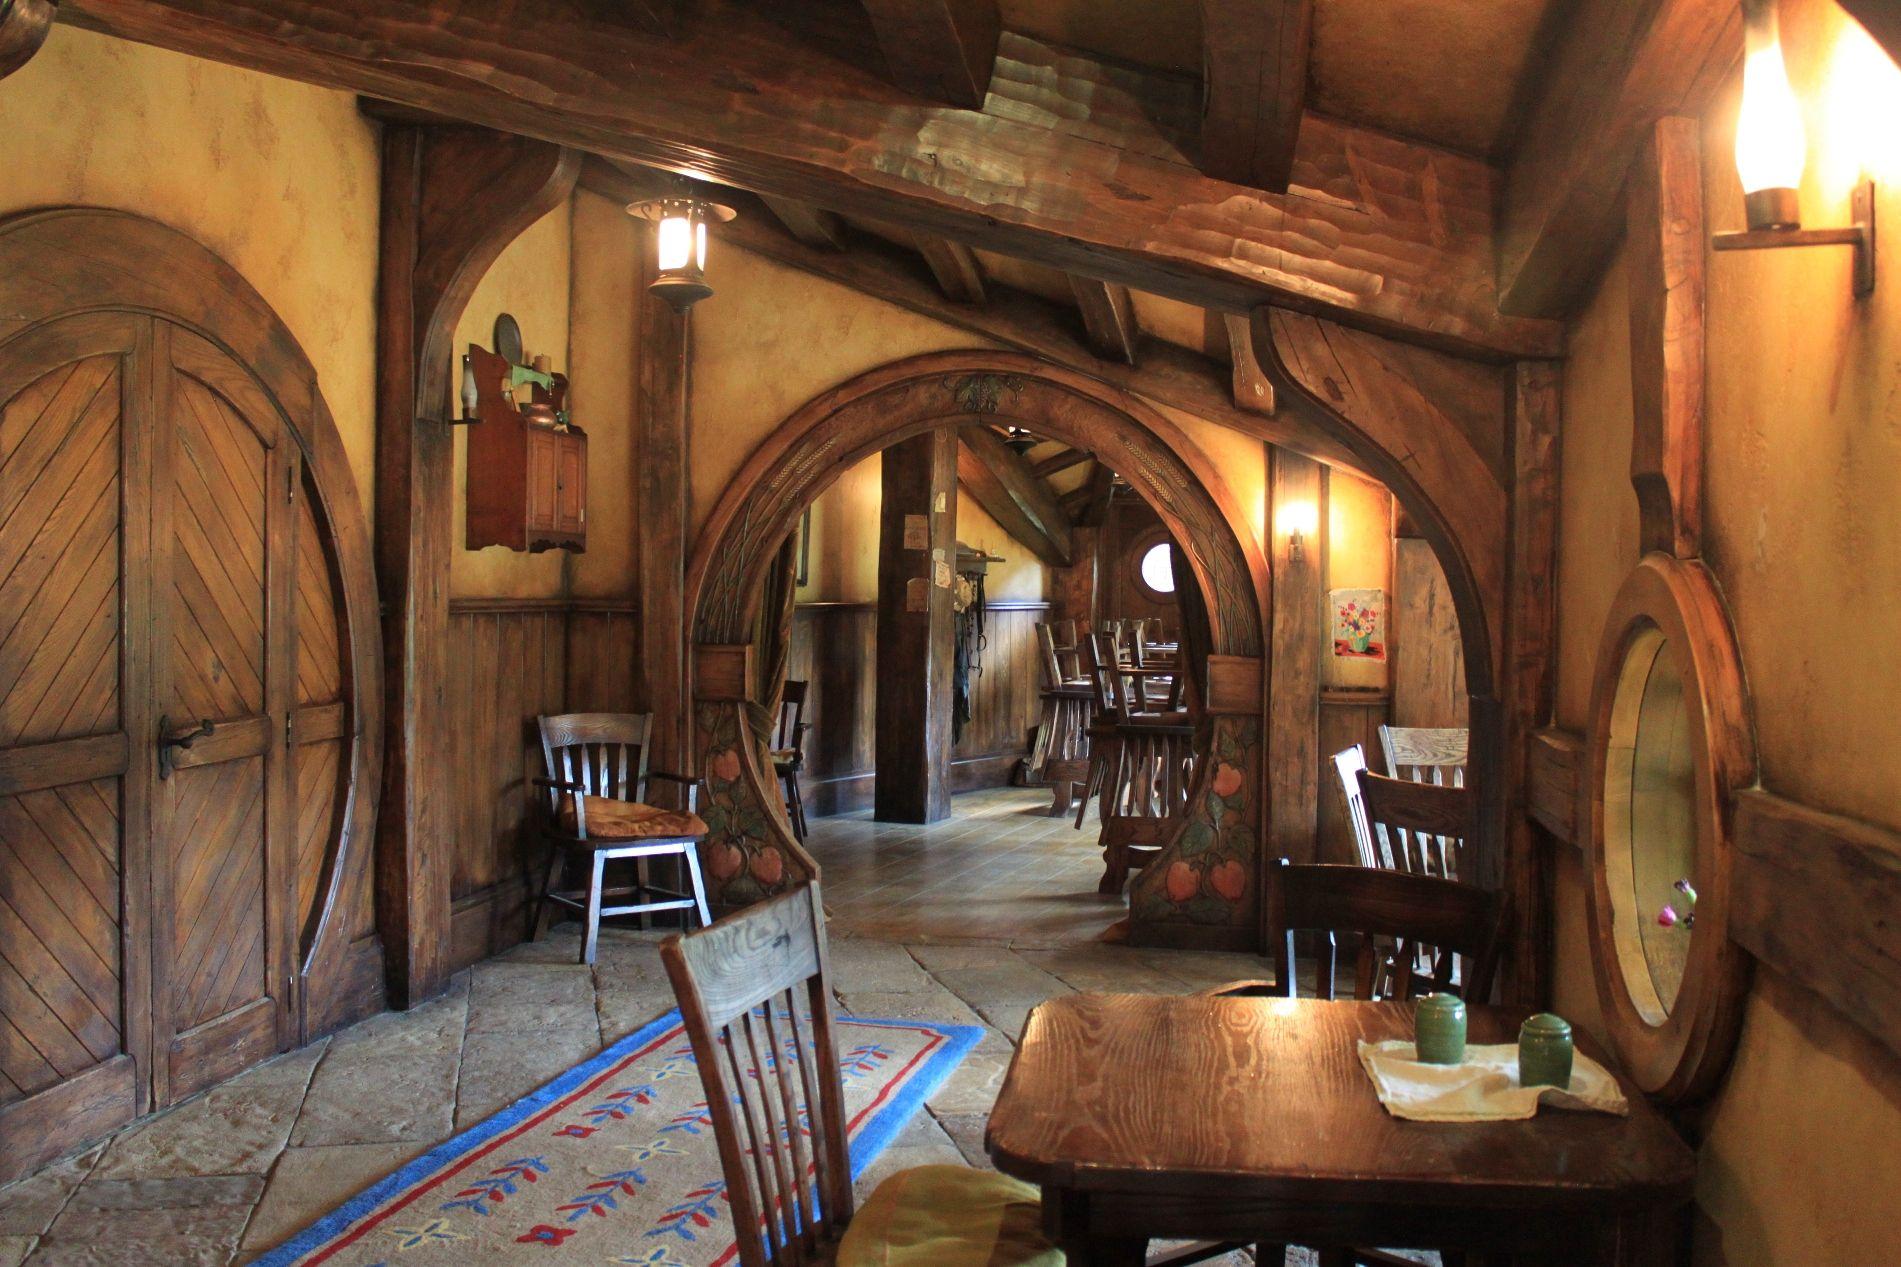 Hobbit Interior Design the hobbit bag end house interior | tag archives: the hobbit | bag